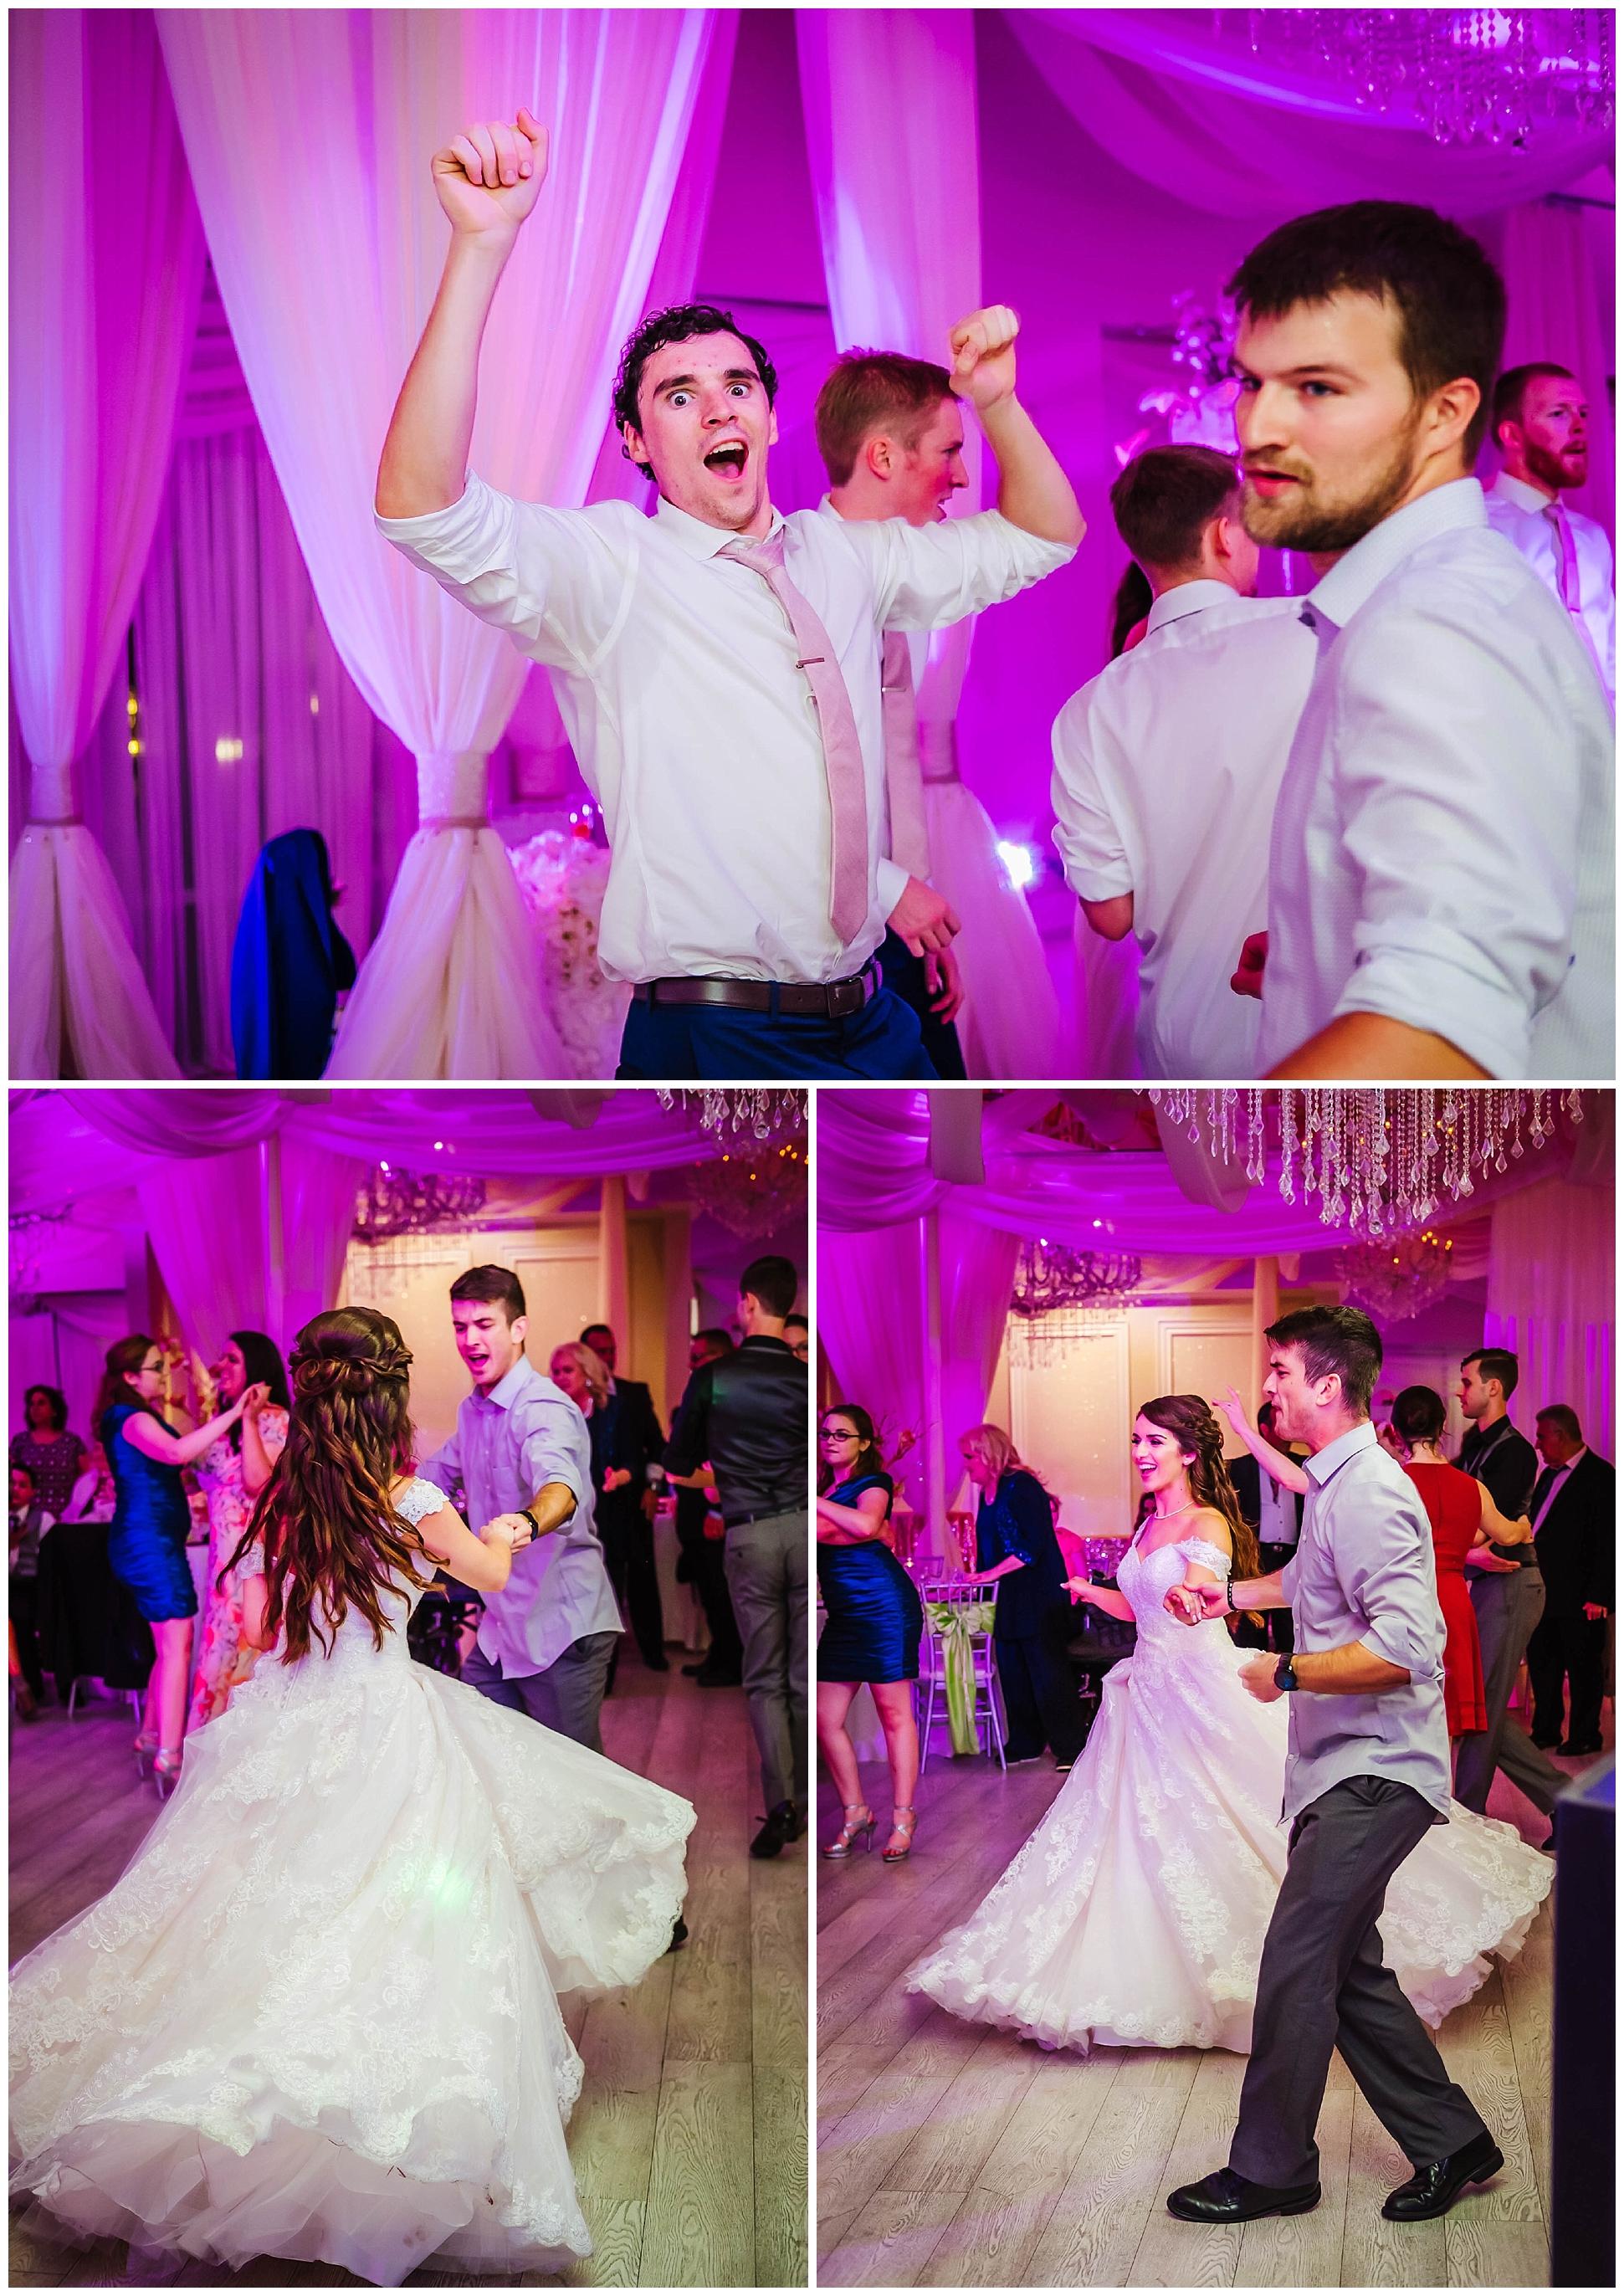 st-pete-wedding-photographer-sunken-gardens-crystal-ballroom-princess-dancer_0212.jpg